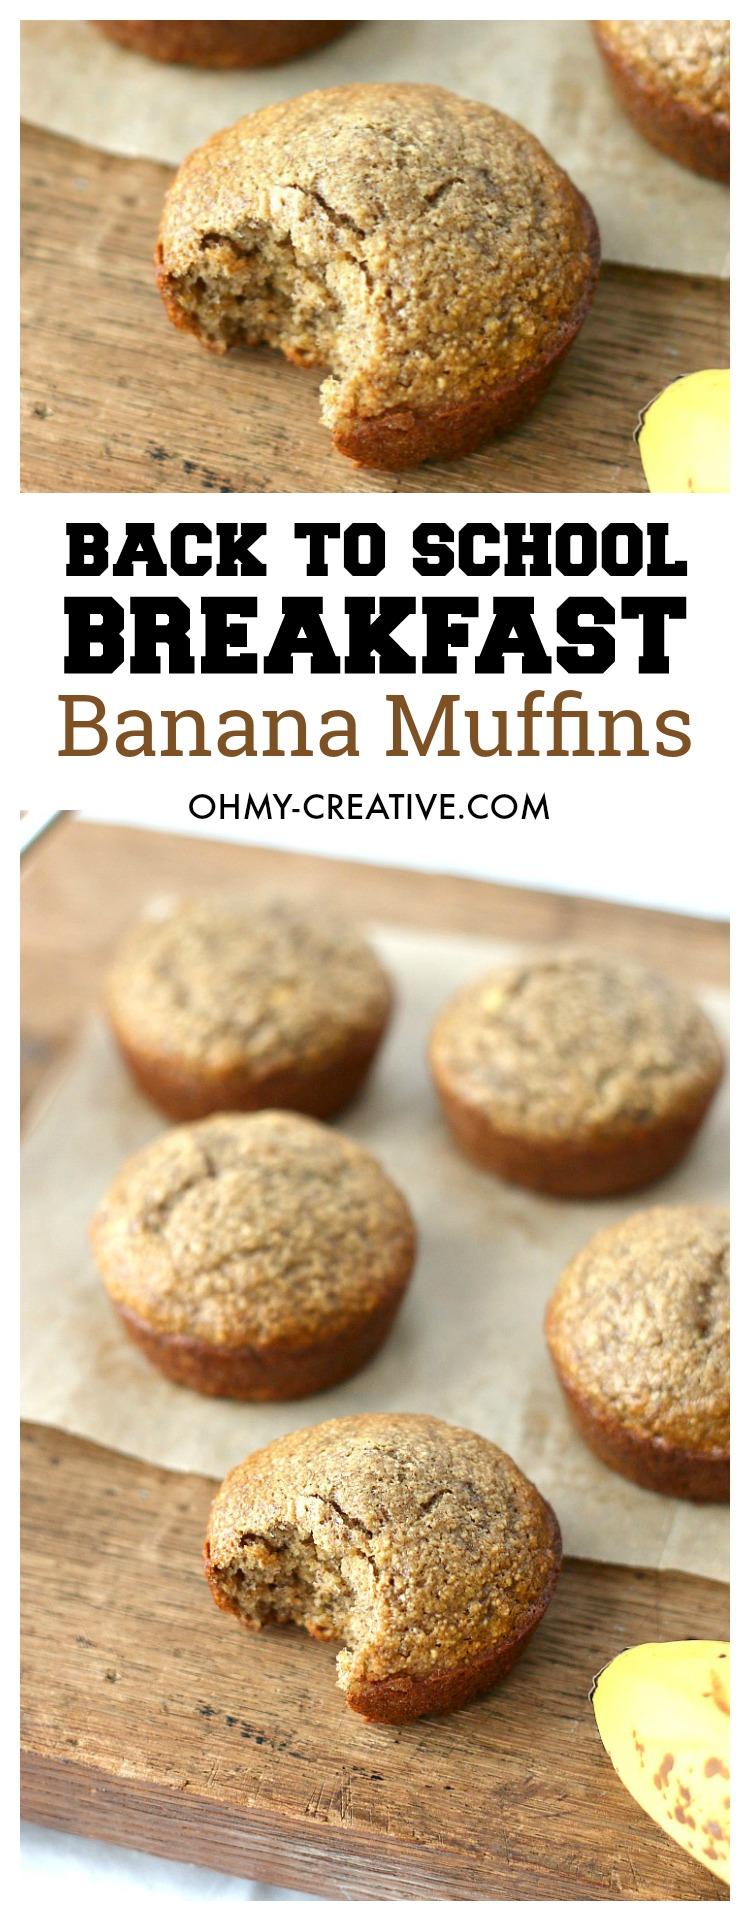 Banana Muffin Recipe | OHMY-CREATIVE.COM | Banana Muffins | Healthy Banana Muffins | Banana Muffins Recipe | Easy Banana Muffins | Breakfast Muffins | Breakfast ideas for Kids | Banana Muffins healthy | Back to school breakfast ideas